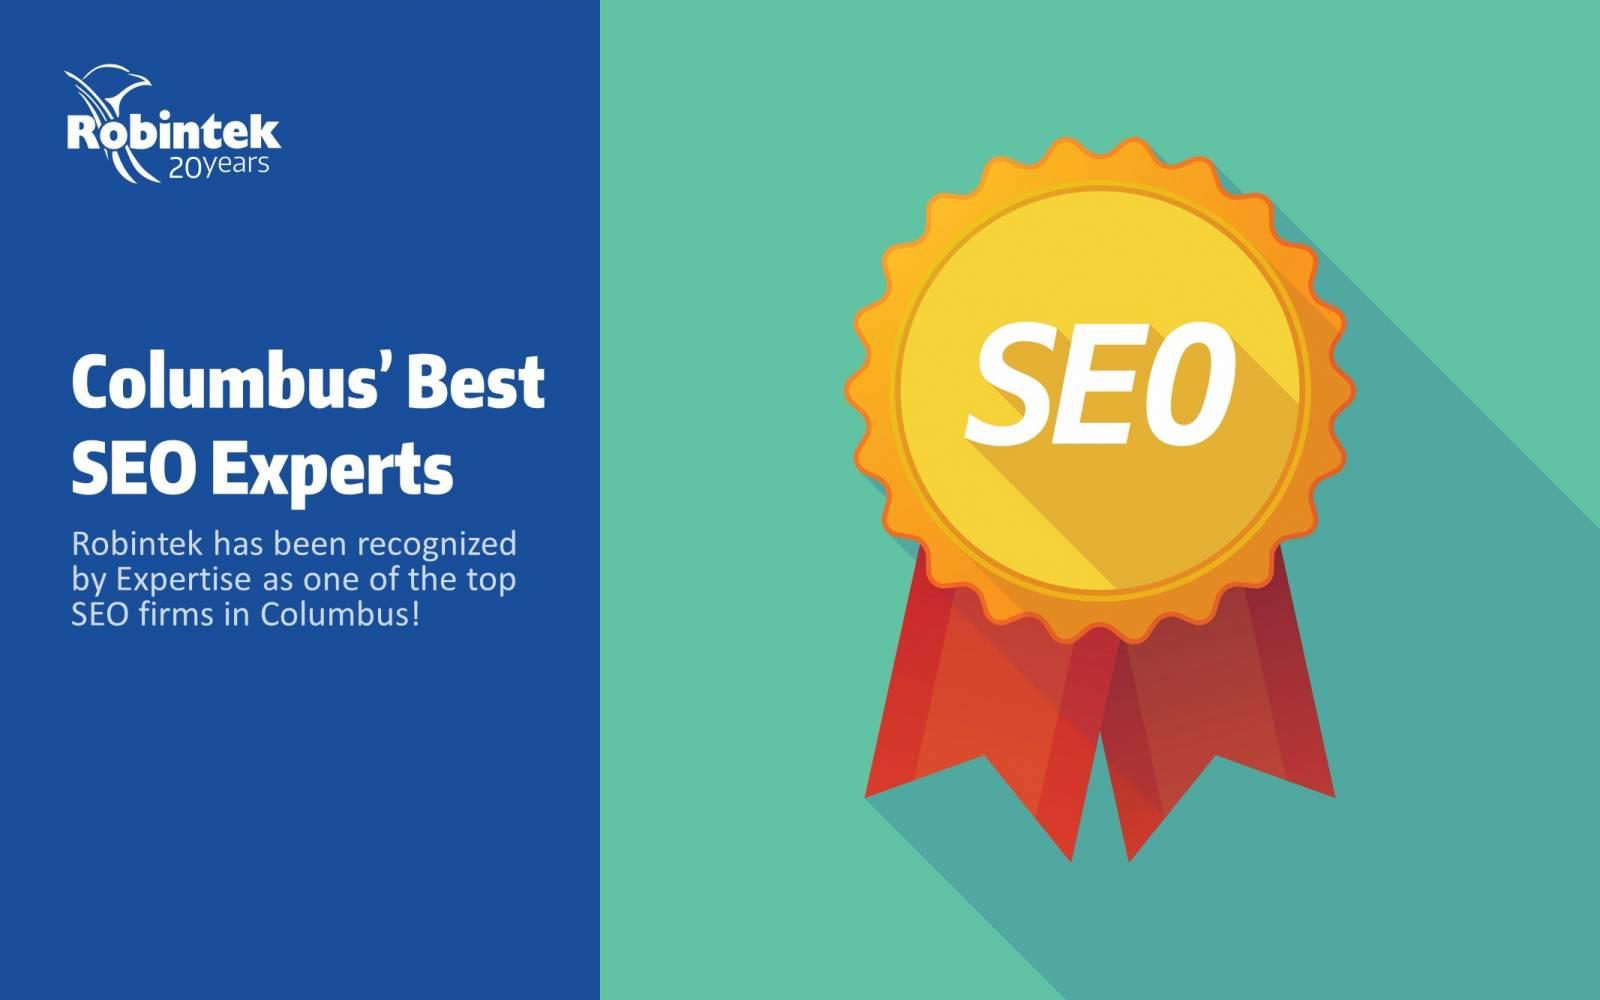 columbus-best-seo-experts